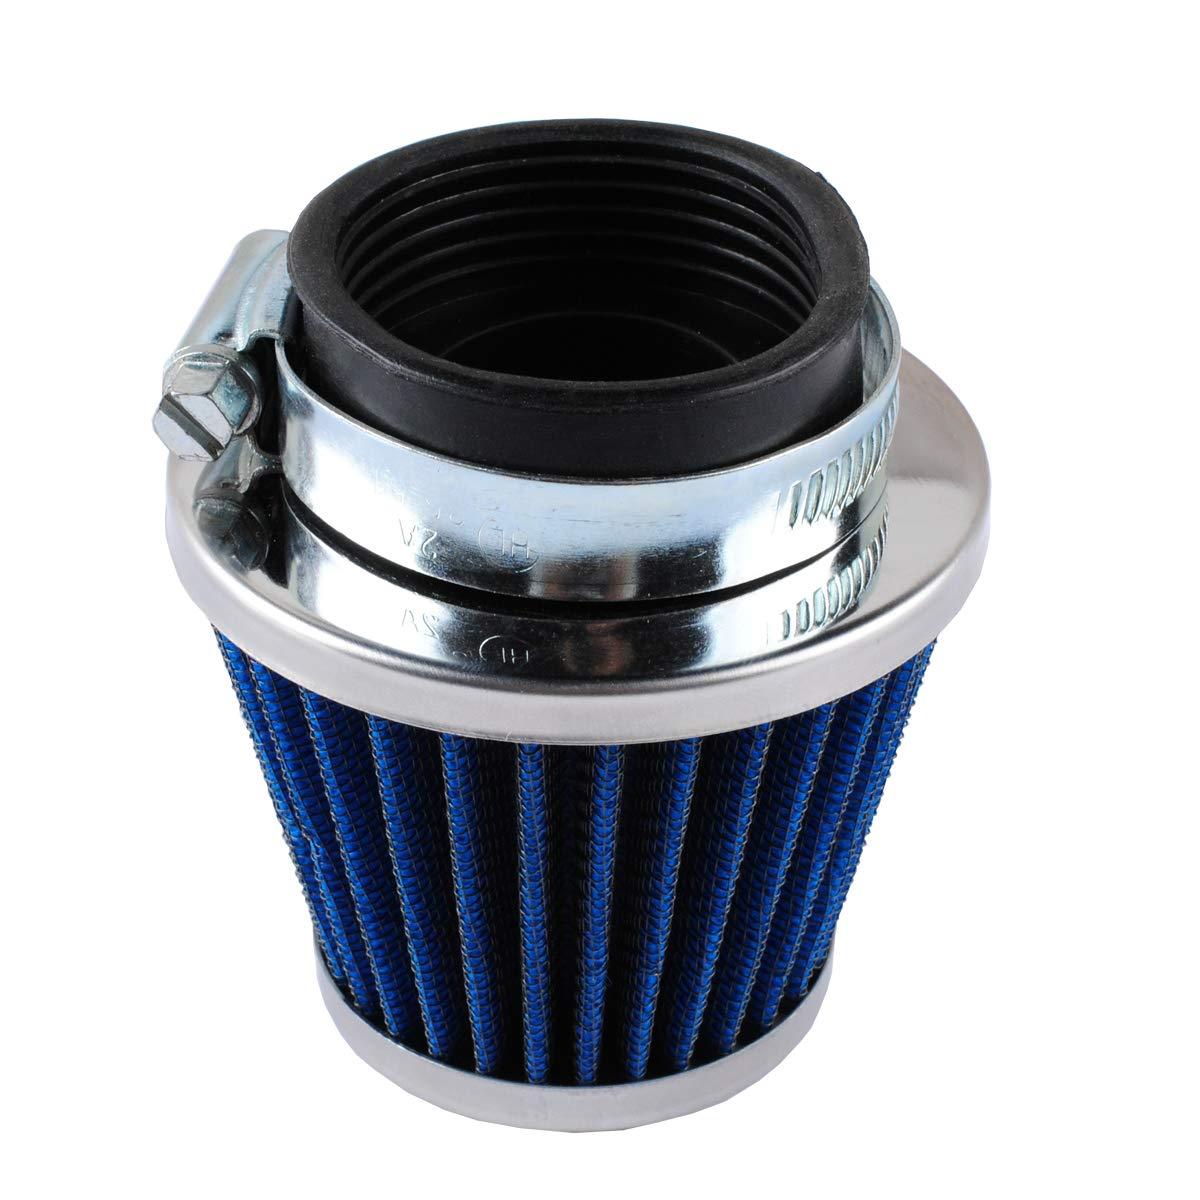 GOOFIT PD24J Carburetor for GY6 150cc ATV Scooter 157QMJ Engine